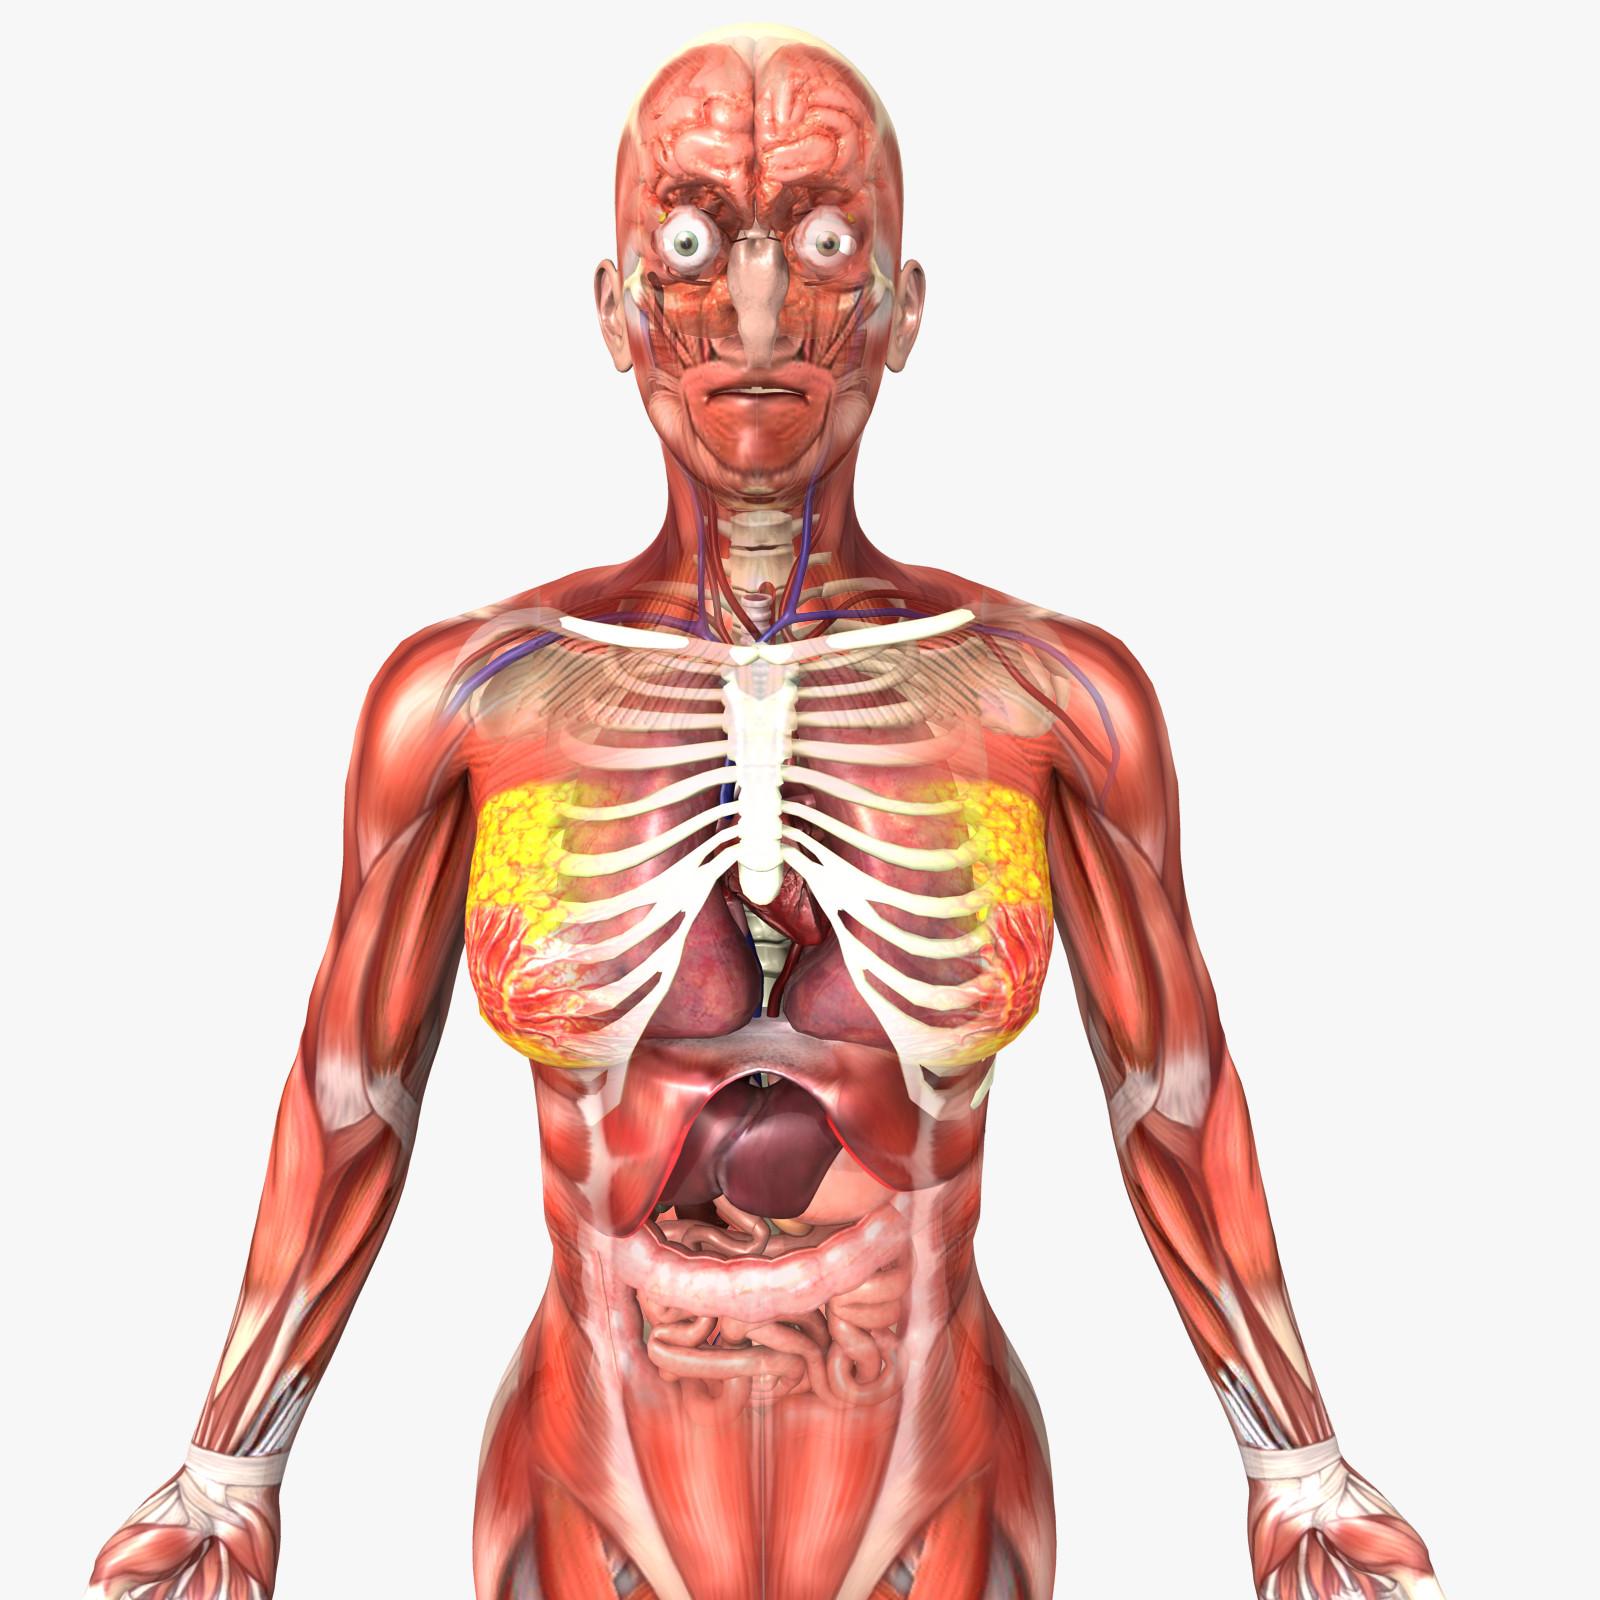 Human Body Internal Organs - Anatomy 3D Model